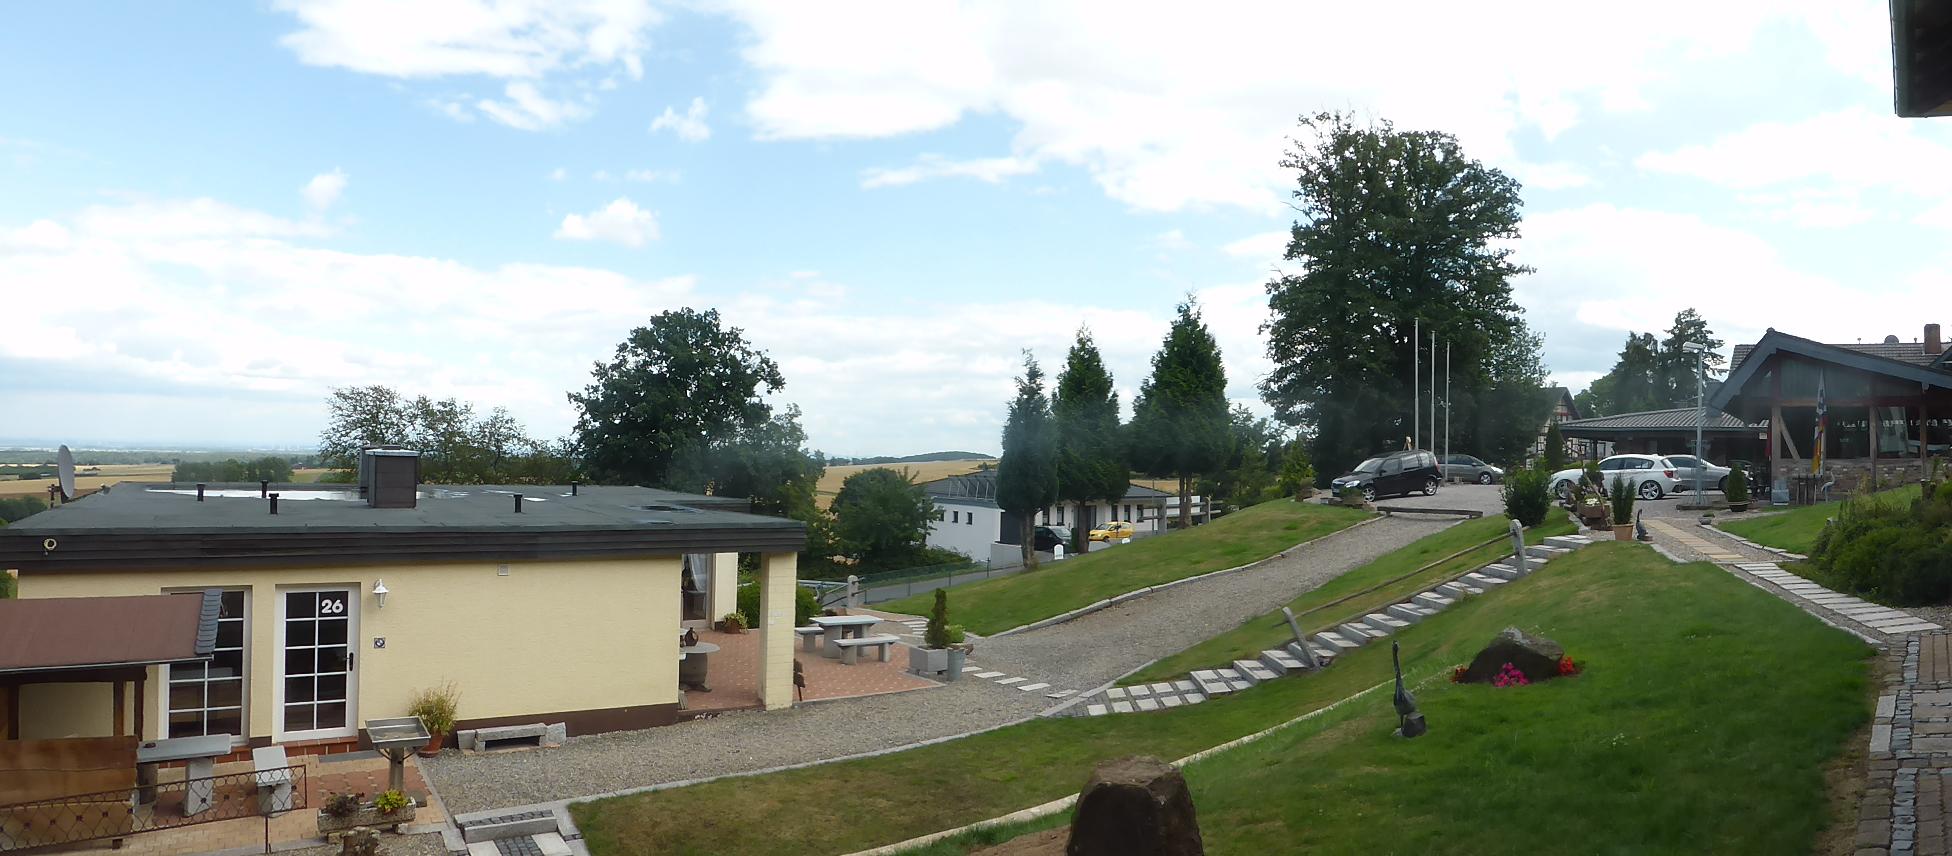 Spölgen,Spoelgen,Nidegggen, Landhotel Nideggen,mein domizil Hotel,Christophorus,